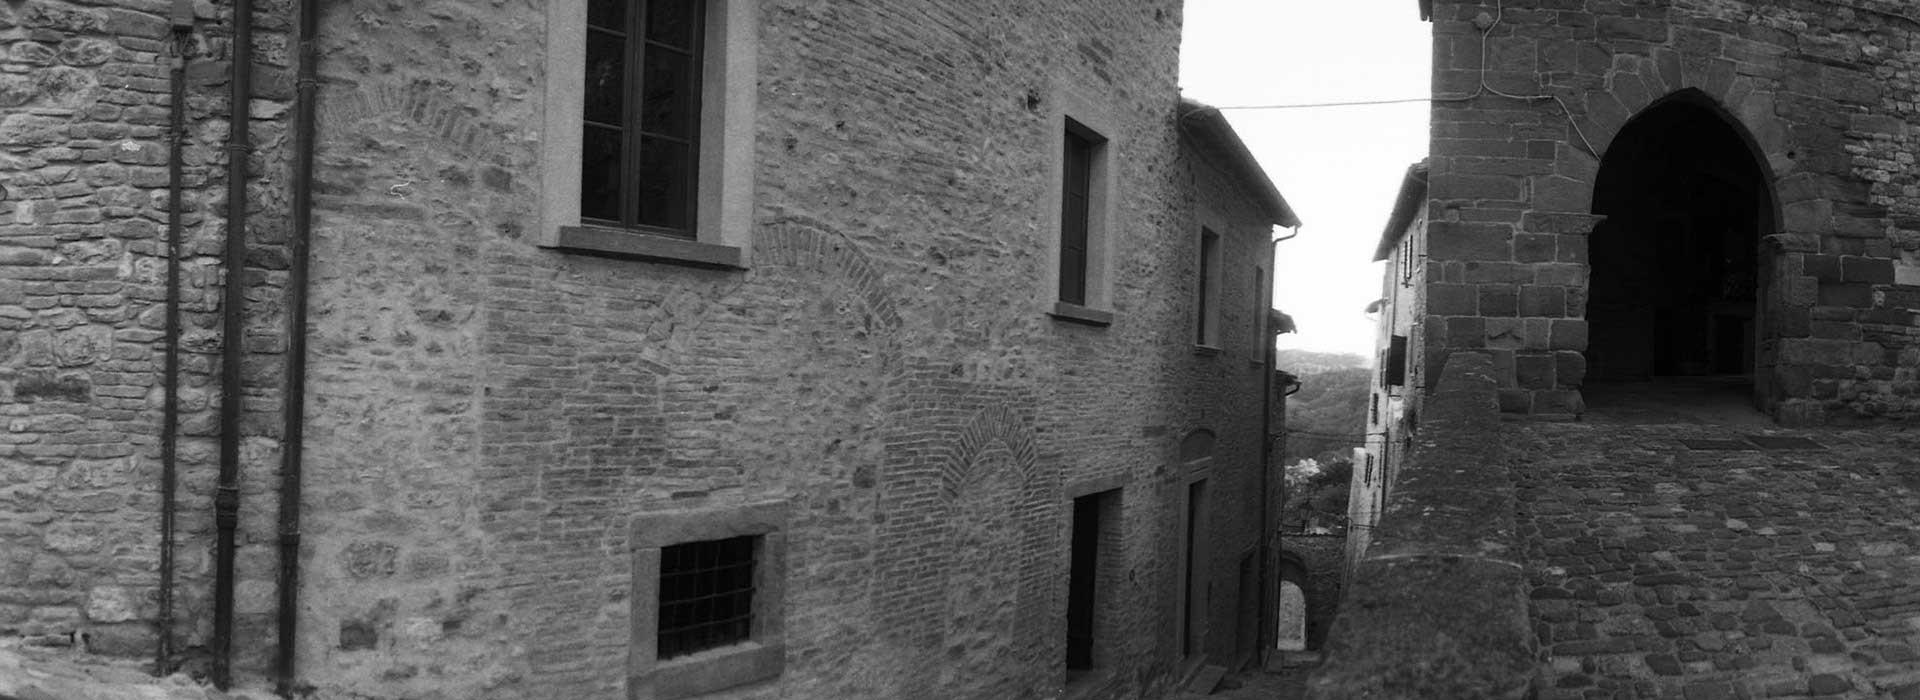 palazzo-valturio-veduta-panoramica-esterna